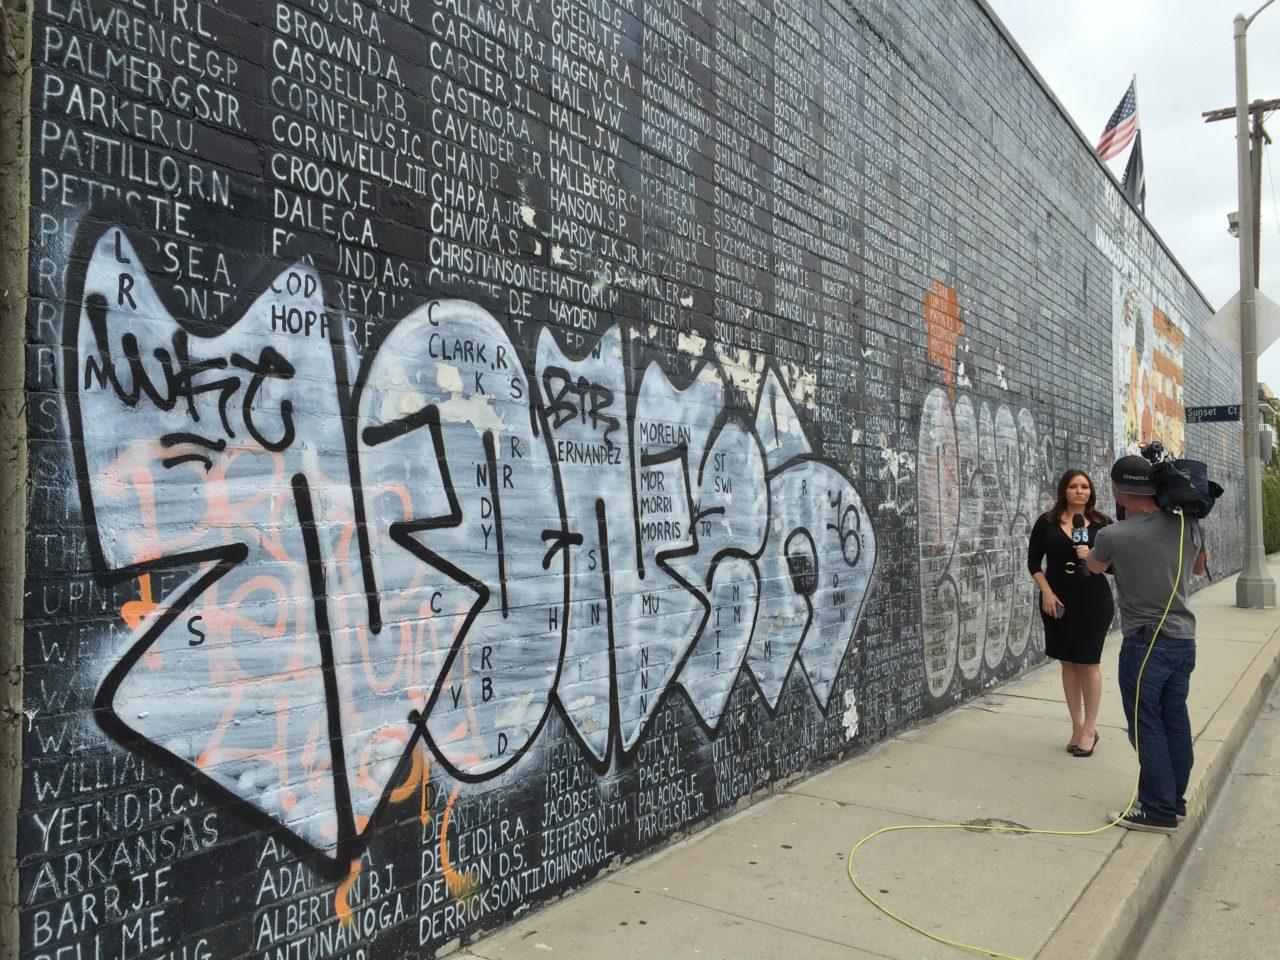 Star Wars Wall Mural Veteran Pleads For Help In Restoring L A Vietnam Memorial